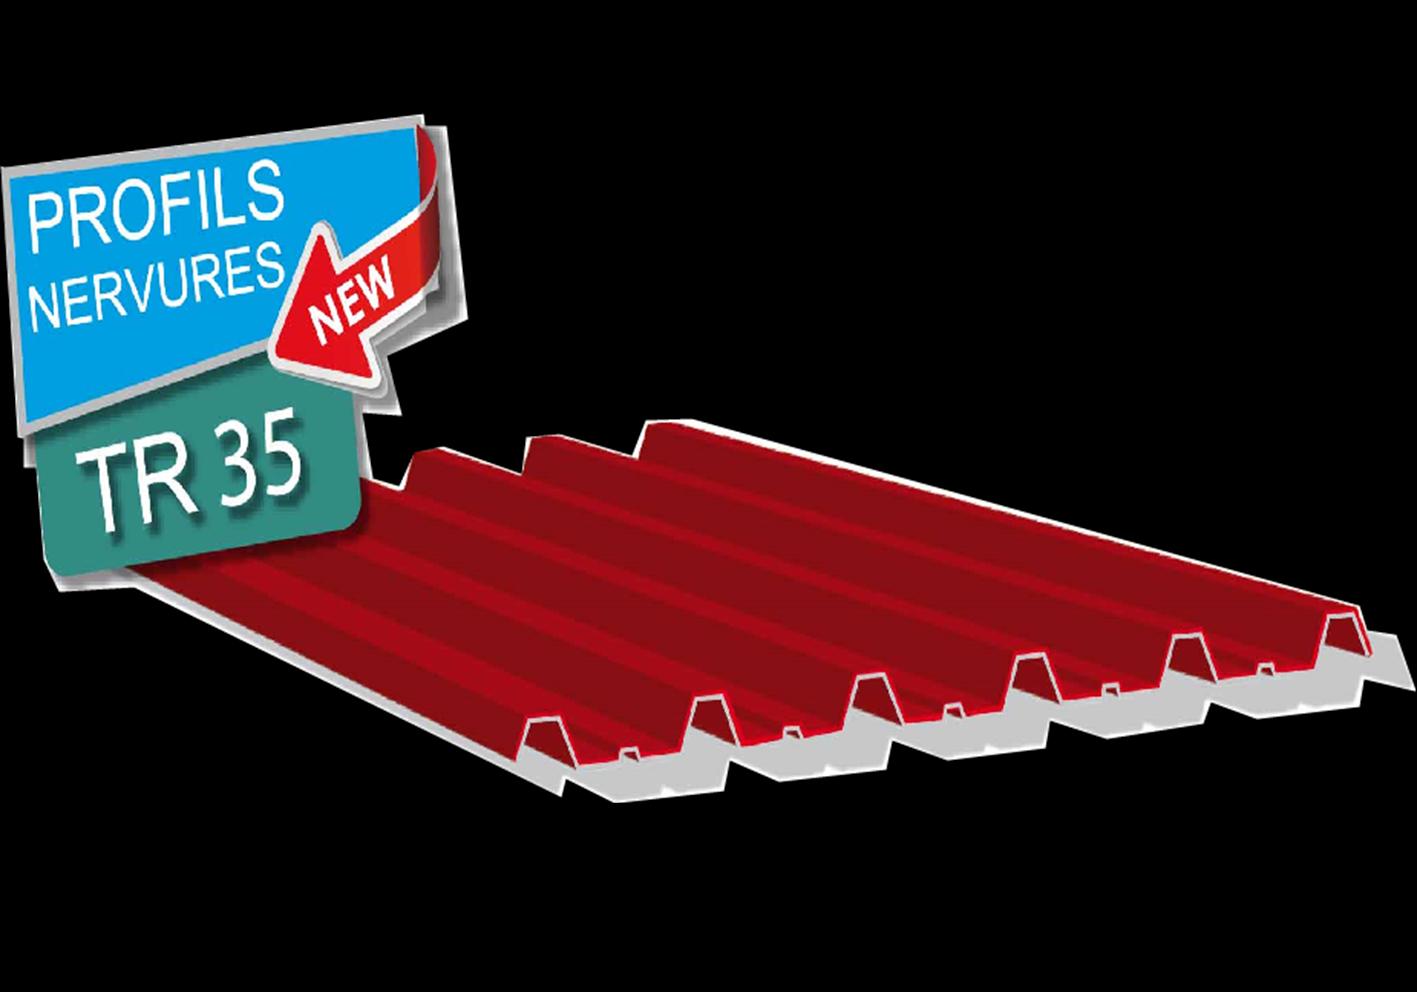 PROFILS NERVURES TR35